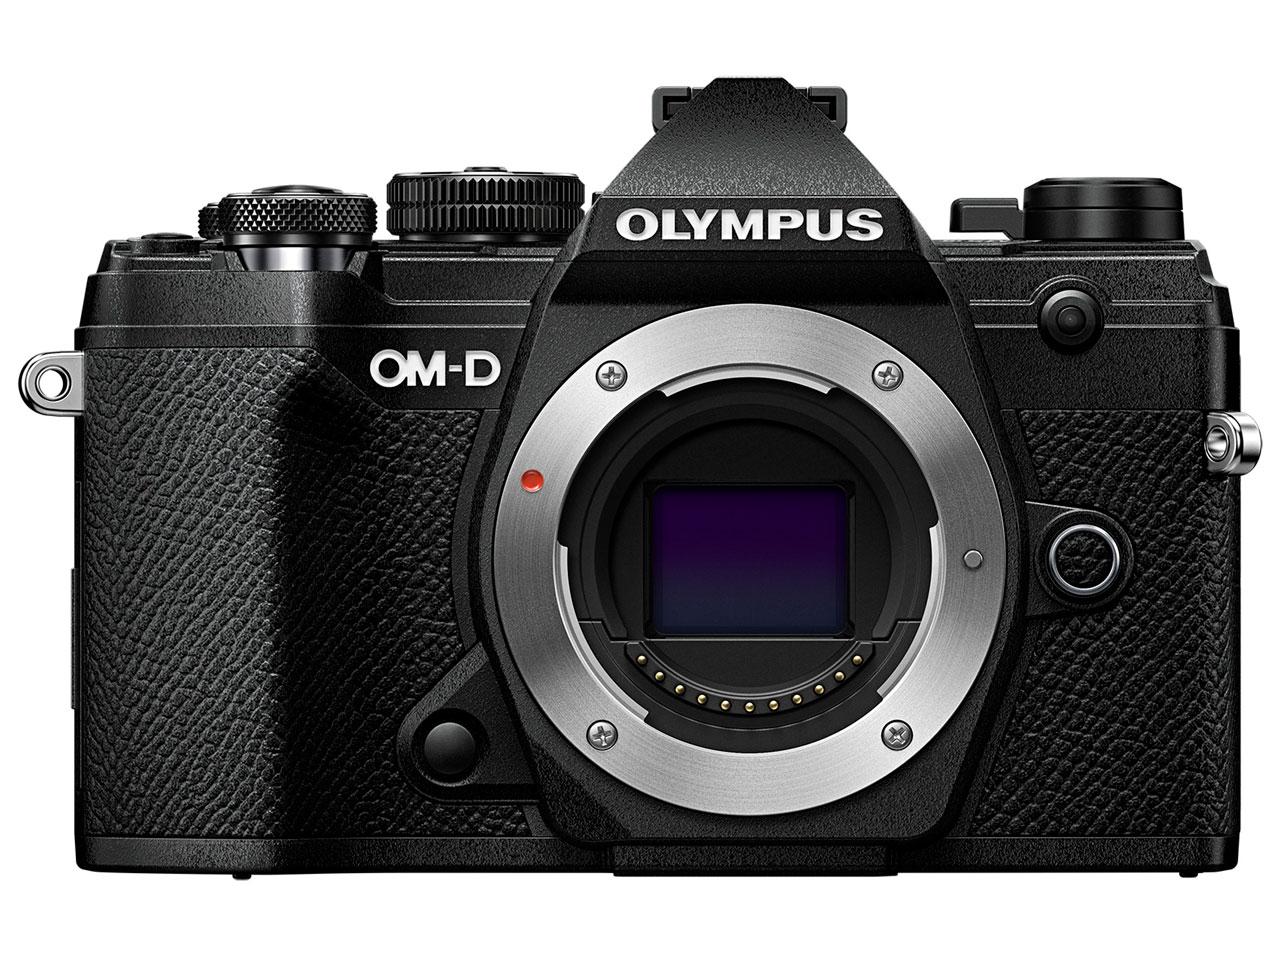 OLYMPUS オリンパス OM-D E-M5 Mark III ボディー(ブラック)(レンズ別売り)